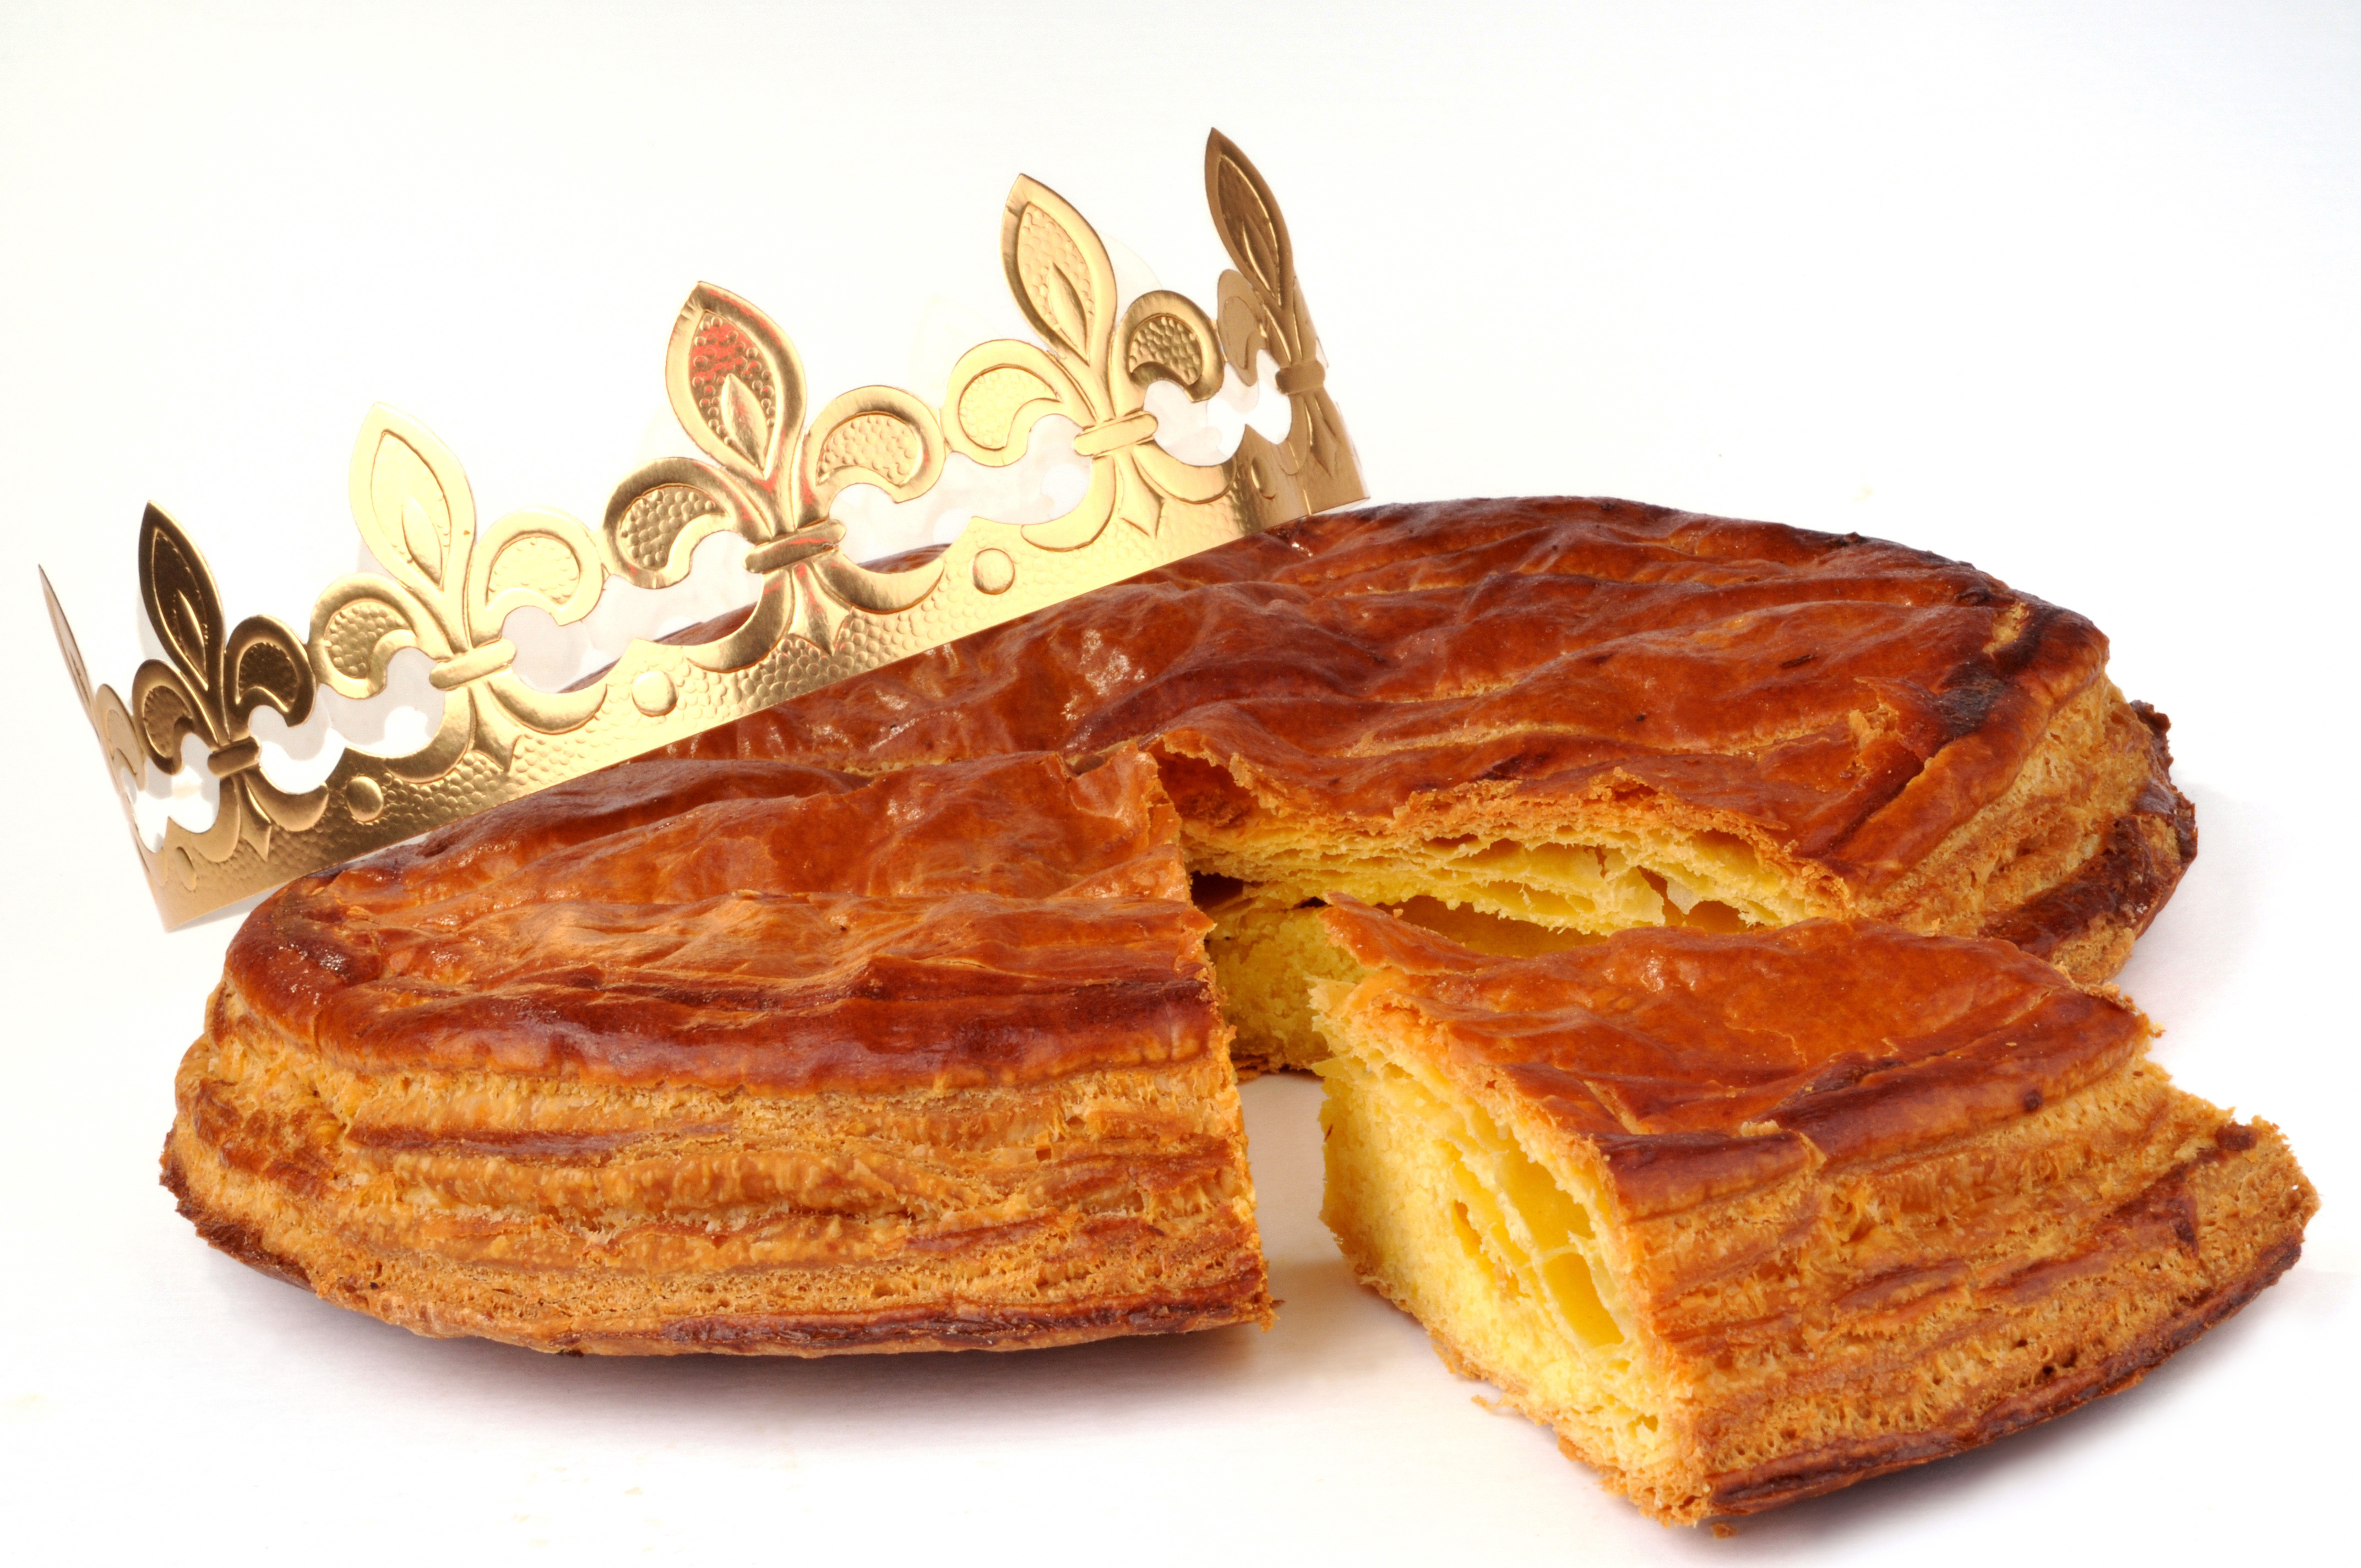 galette-des-rois-1.jpg